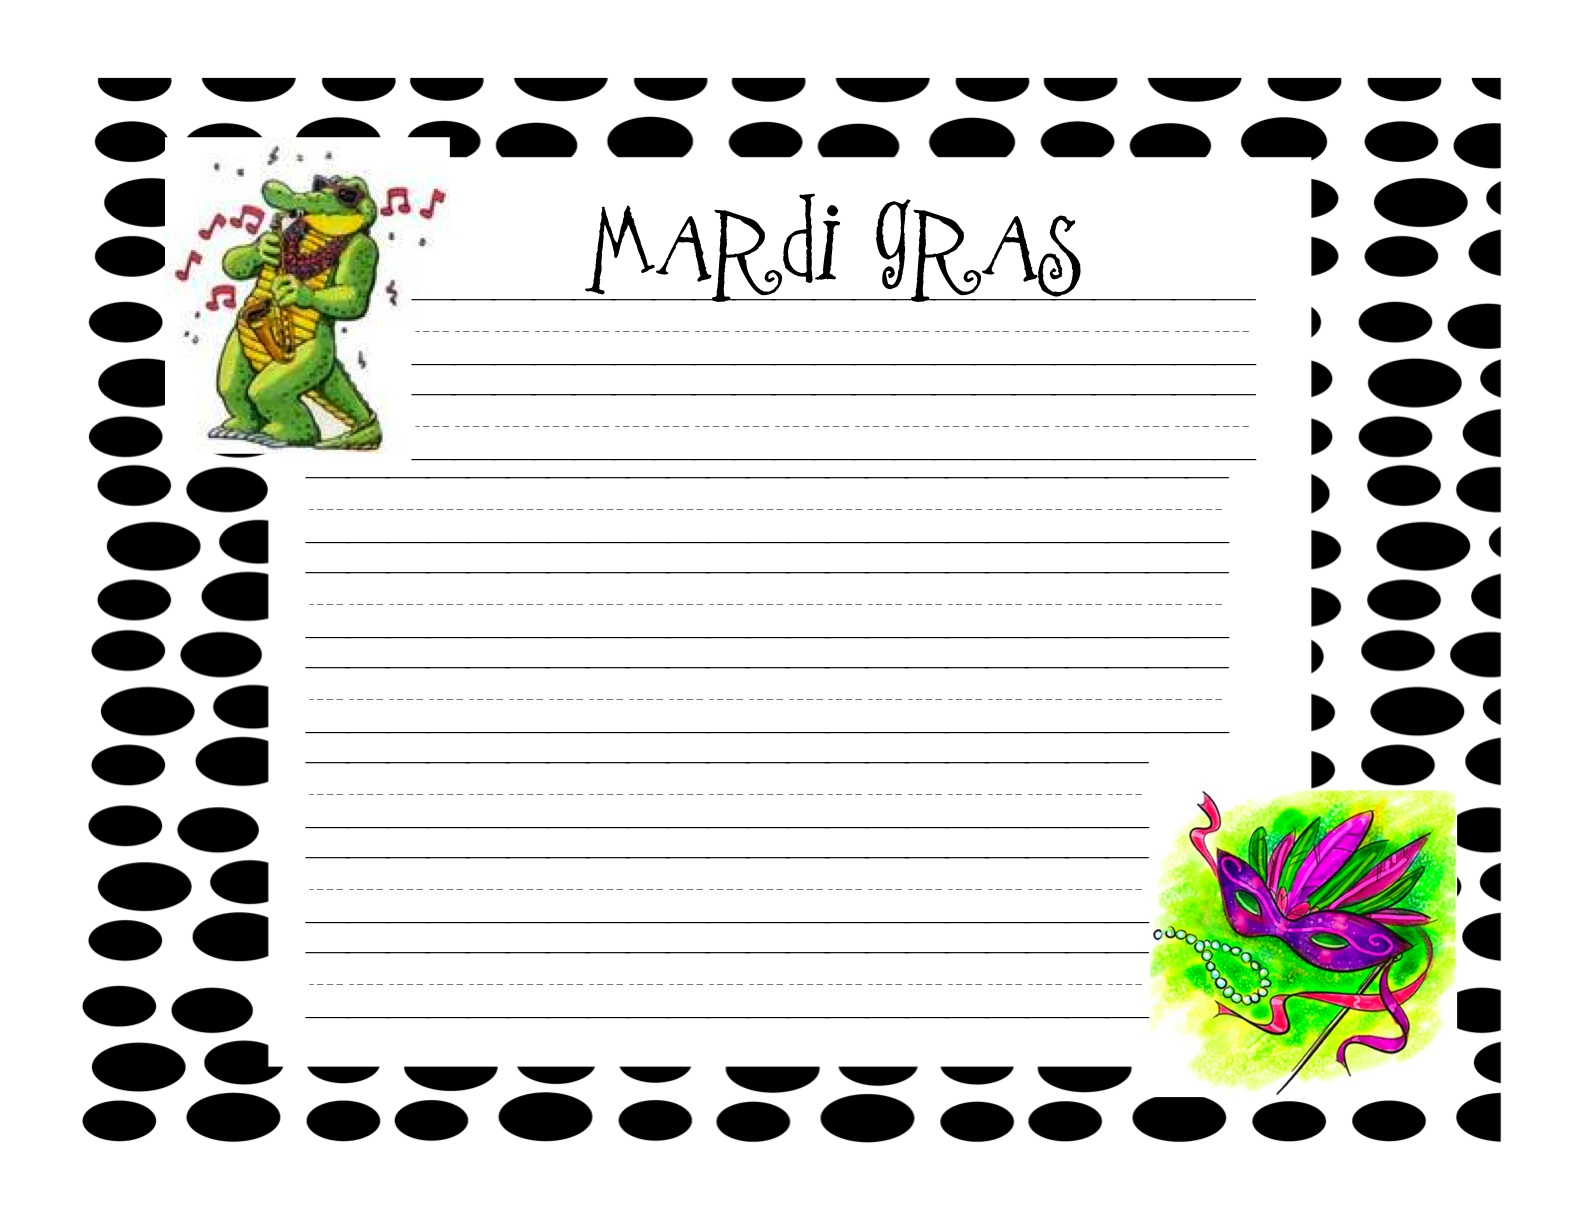 Mardi gras border clipart jpg library Free Free Mardi Gras Borders, Download Free Clip Art, Free ... jpg library